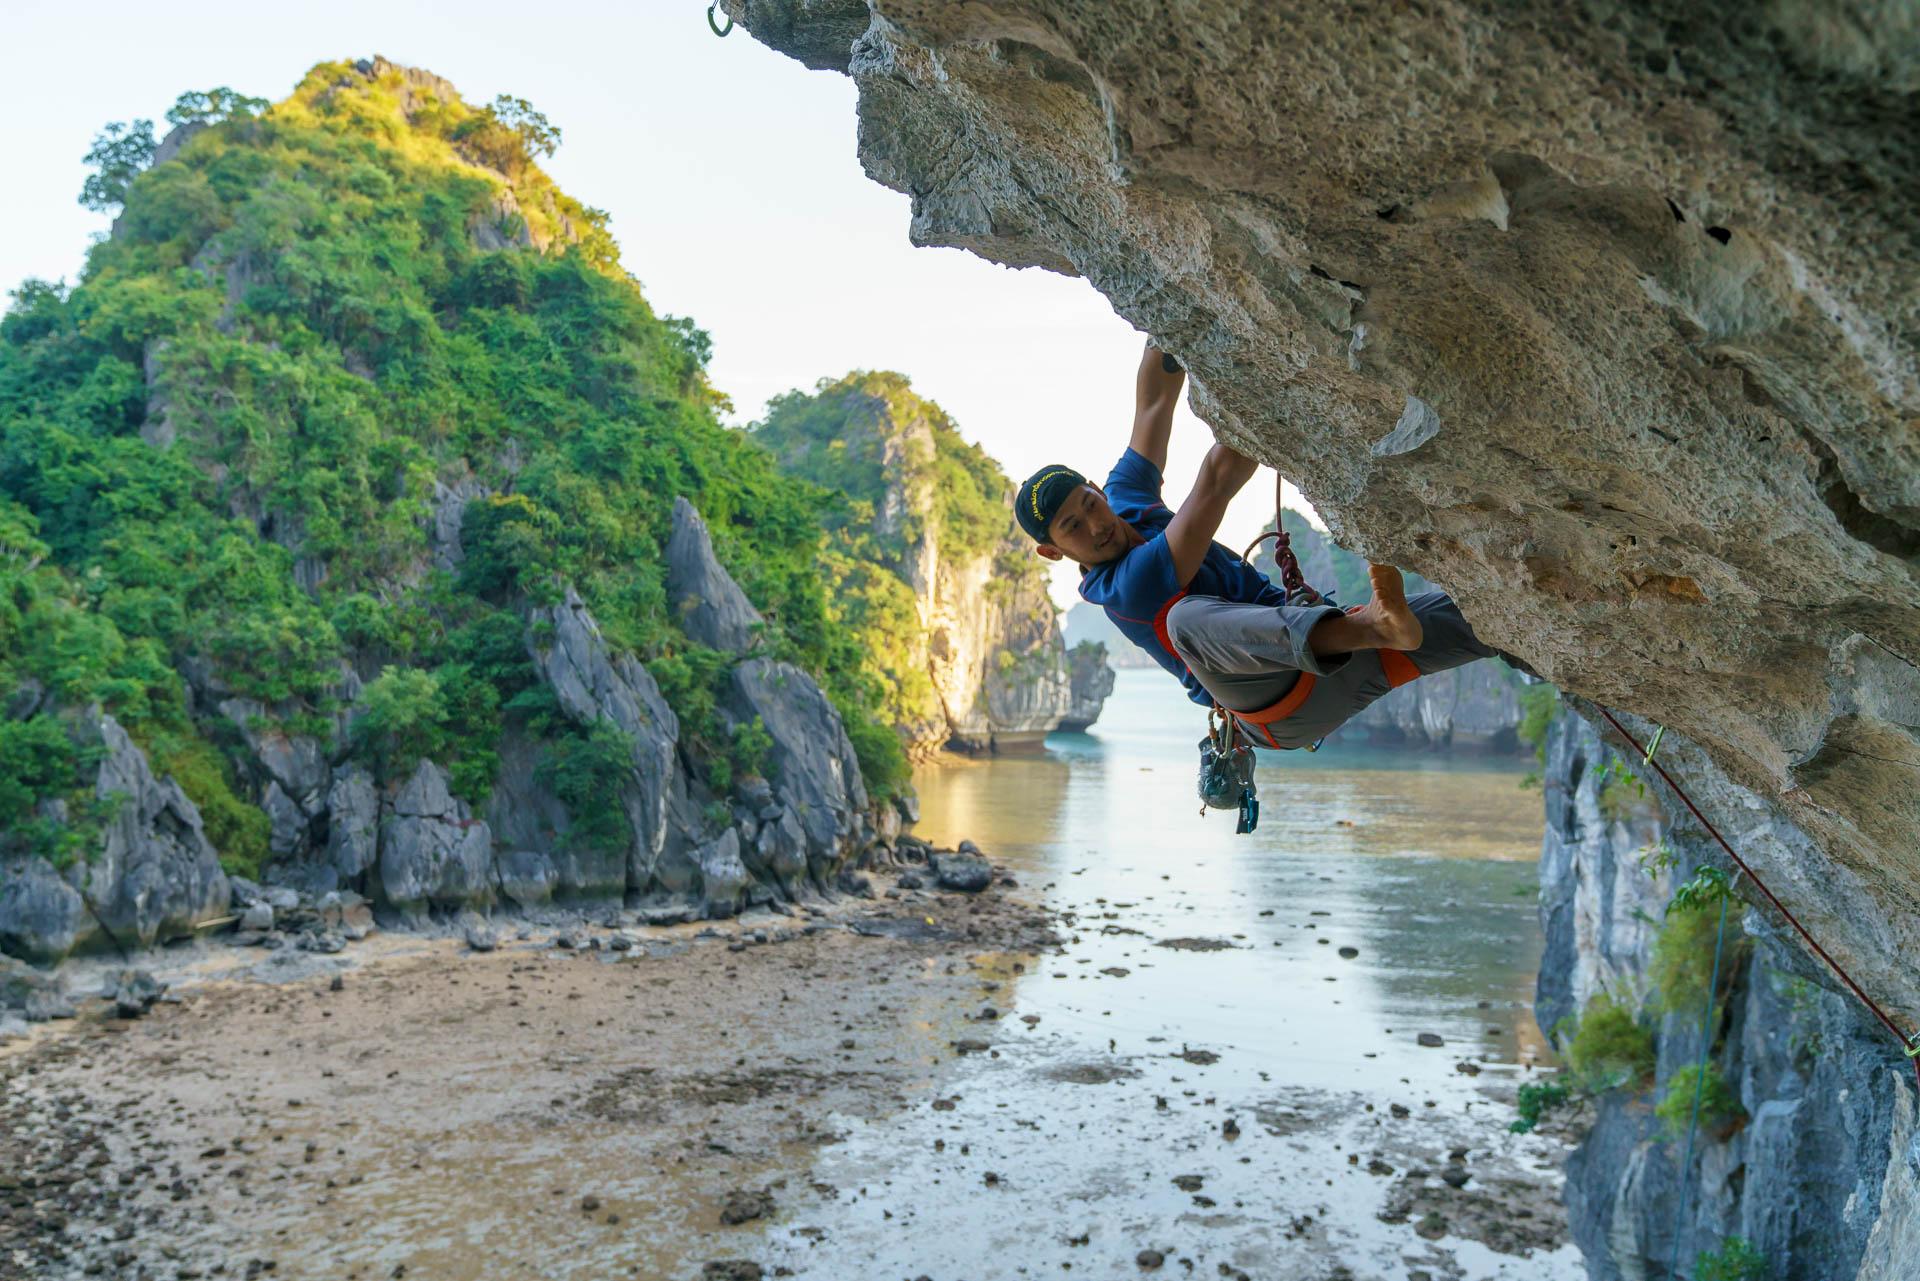 nick barefoot climbing